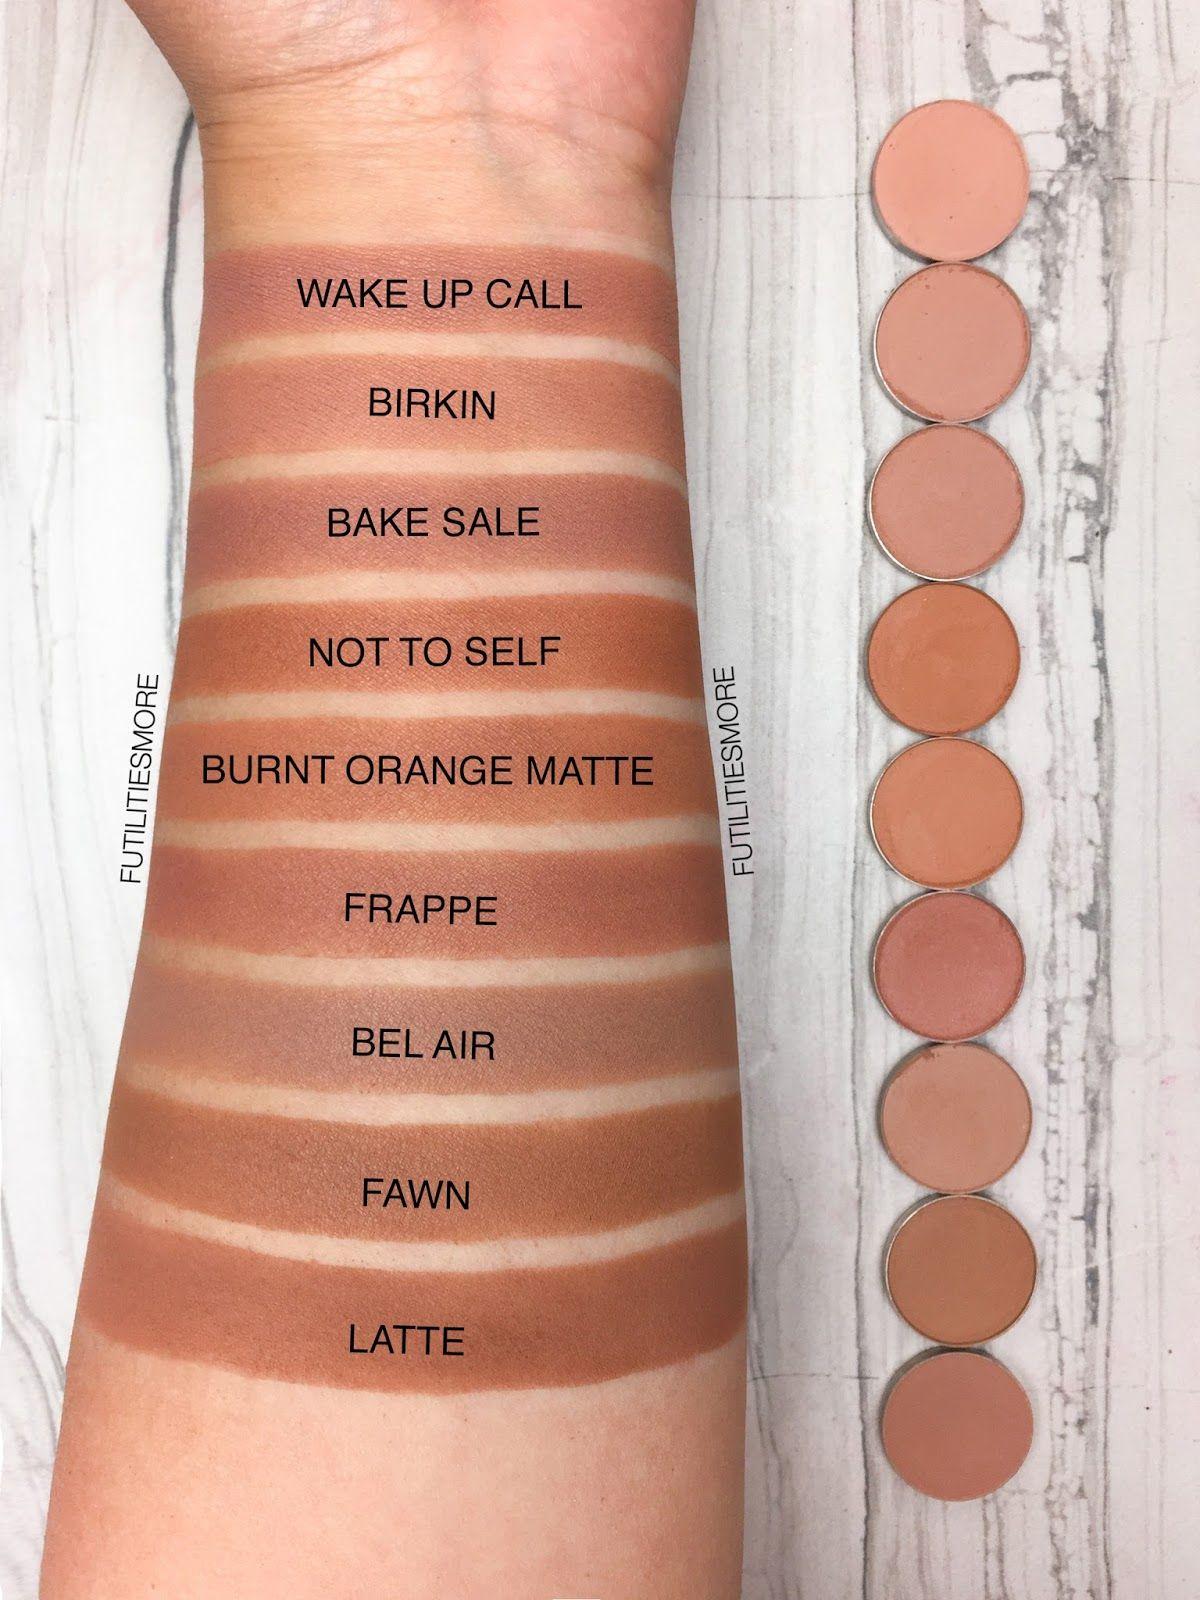 TRANSITION SHADES Medium Browns: Colourpop VS Anastasia